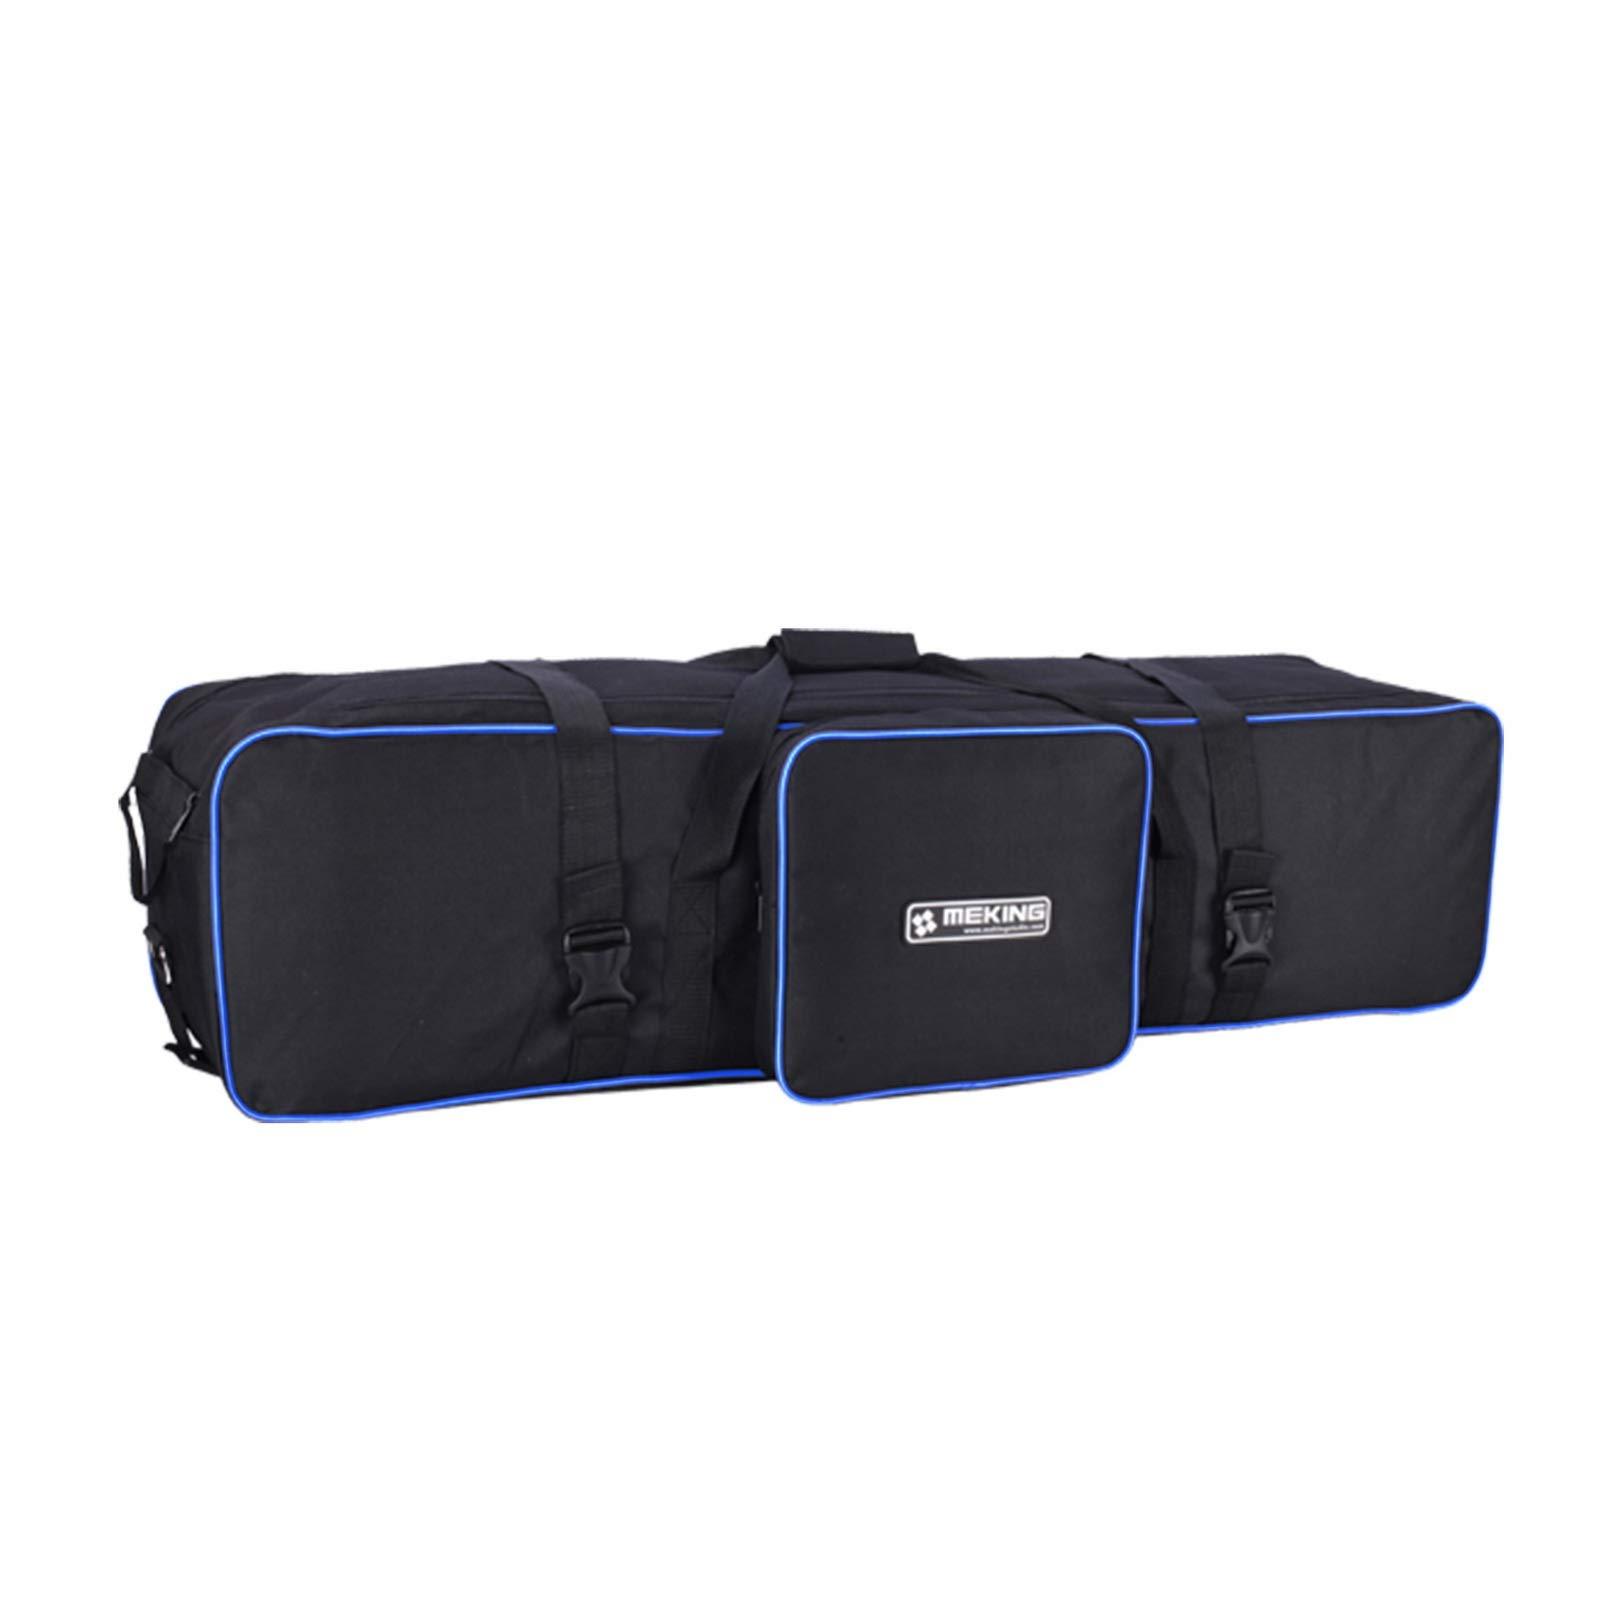 Selens 41 inchx9.8 inchx11.4 inch/105 cmx25 cmx29 cm Photography Equipment Zipper Bag for Light Stands,Umbrellas,and Accessories